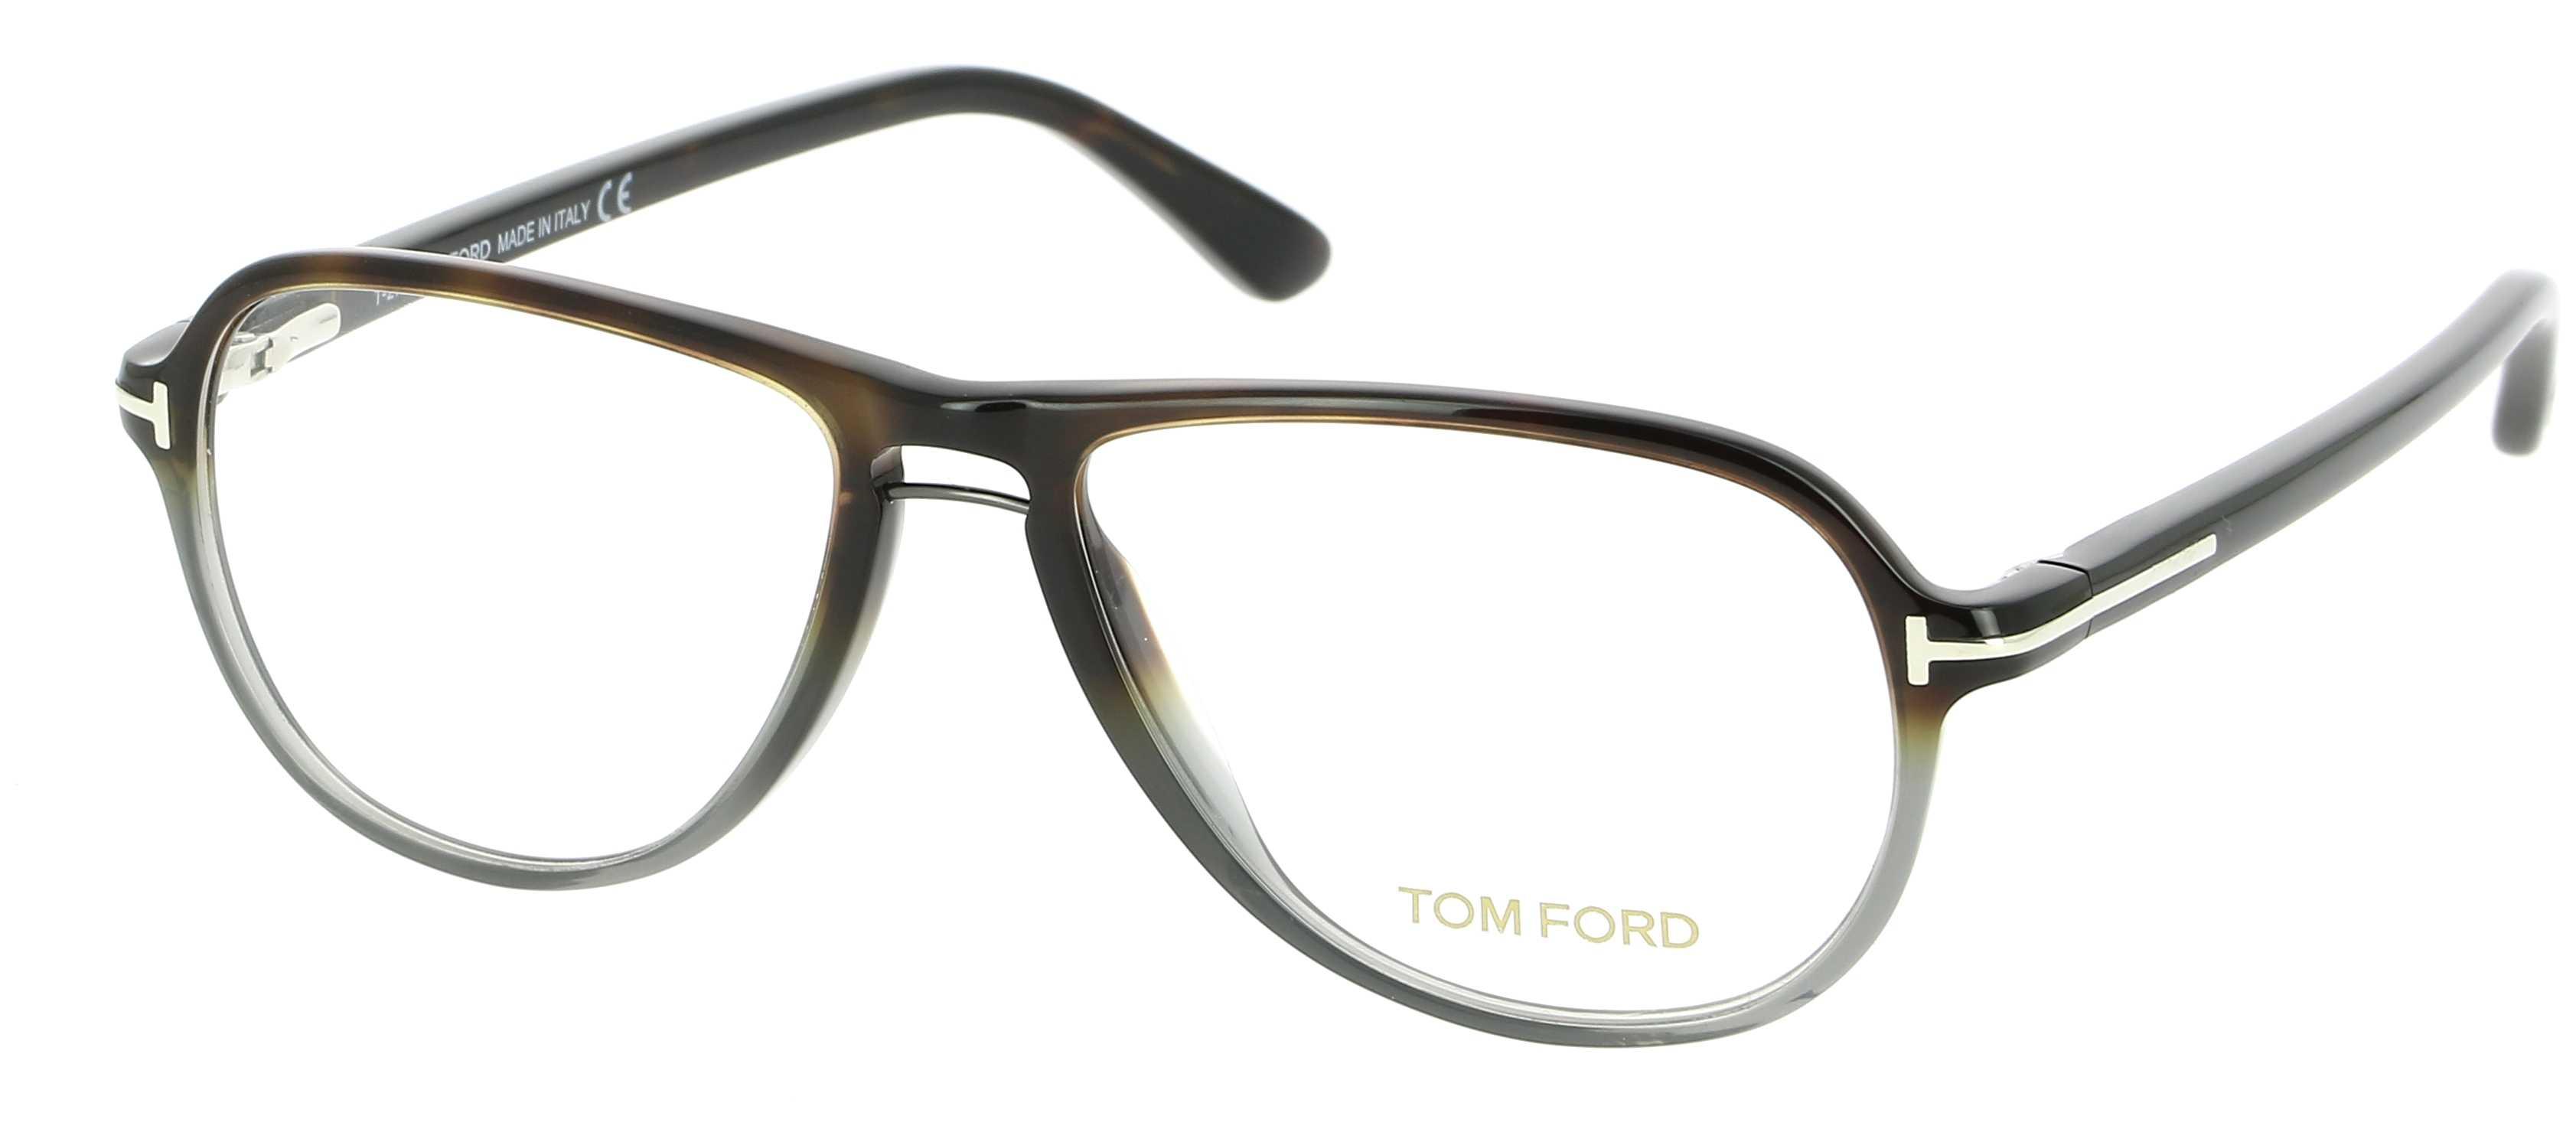 Natation Tom Lunette Ford lunettes Suédoises OZXiPukwT